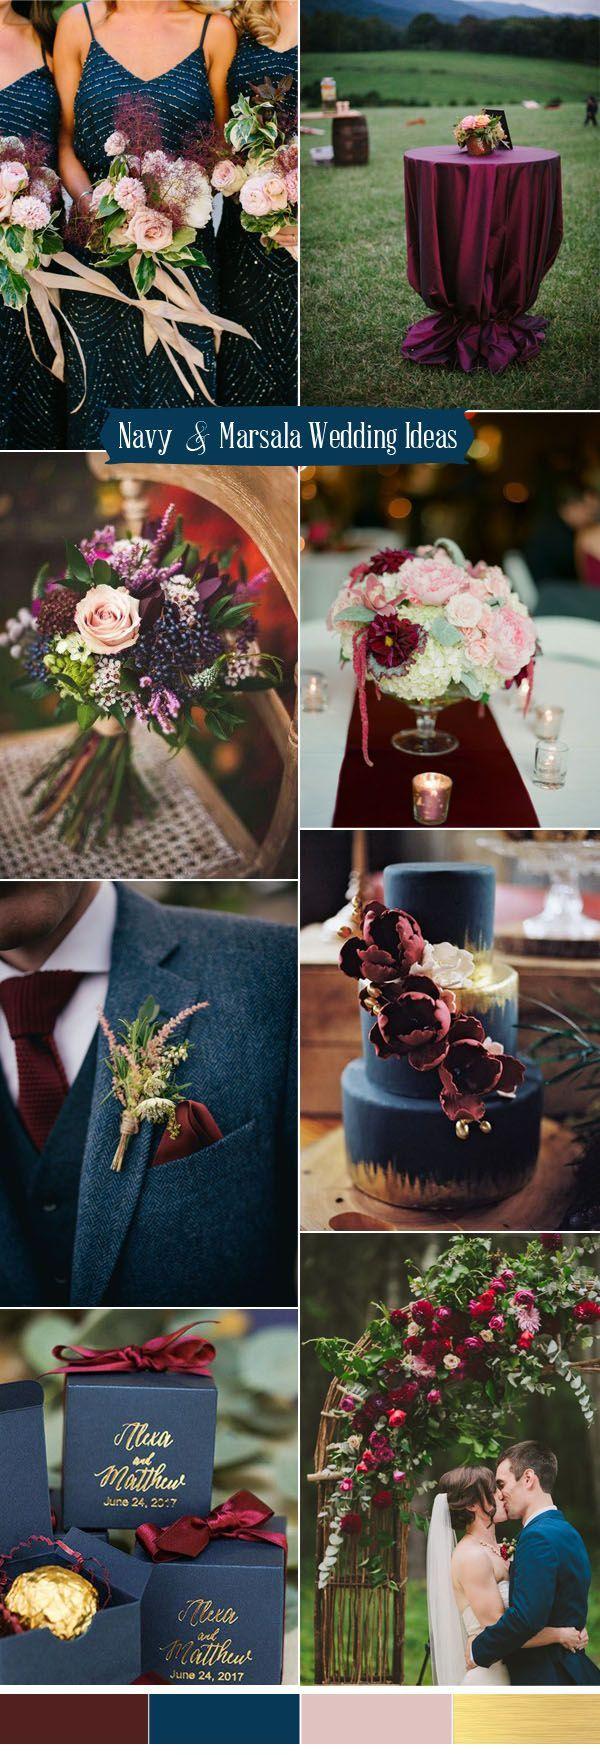 Wedding decorations at church november 2018  best My Wedding images on Pinterest  Wedding ideas Decor